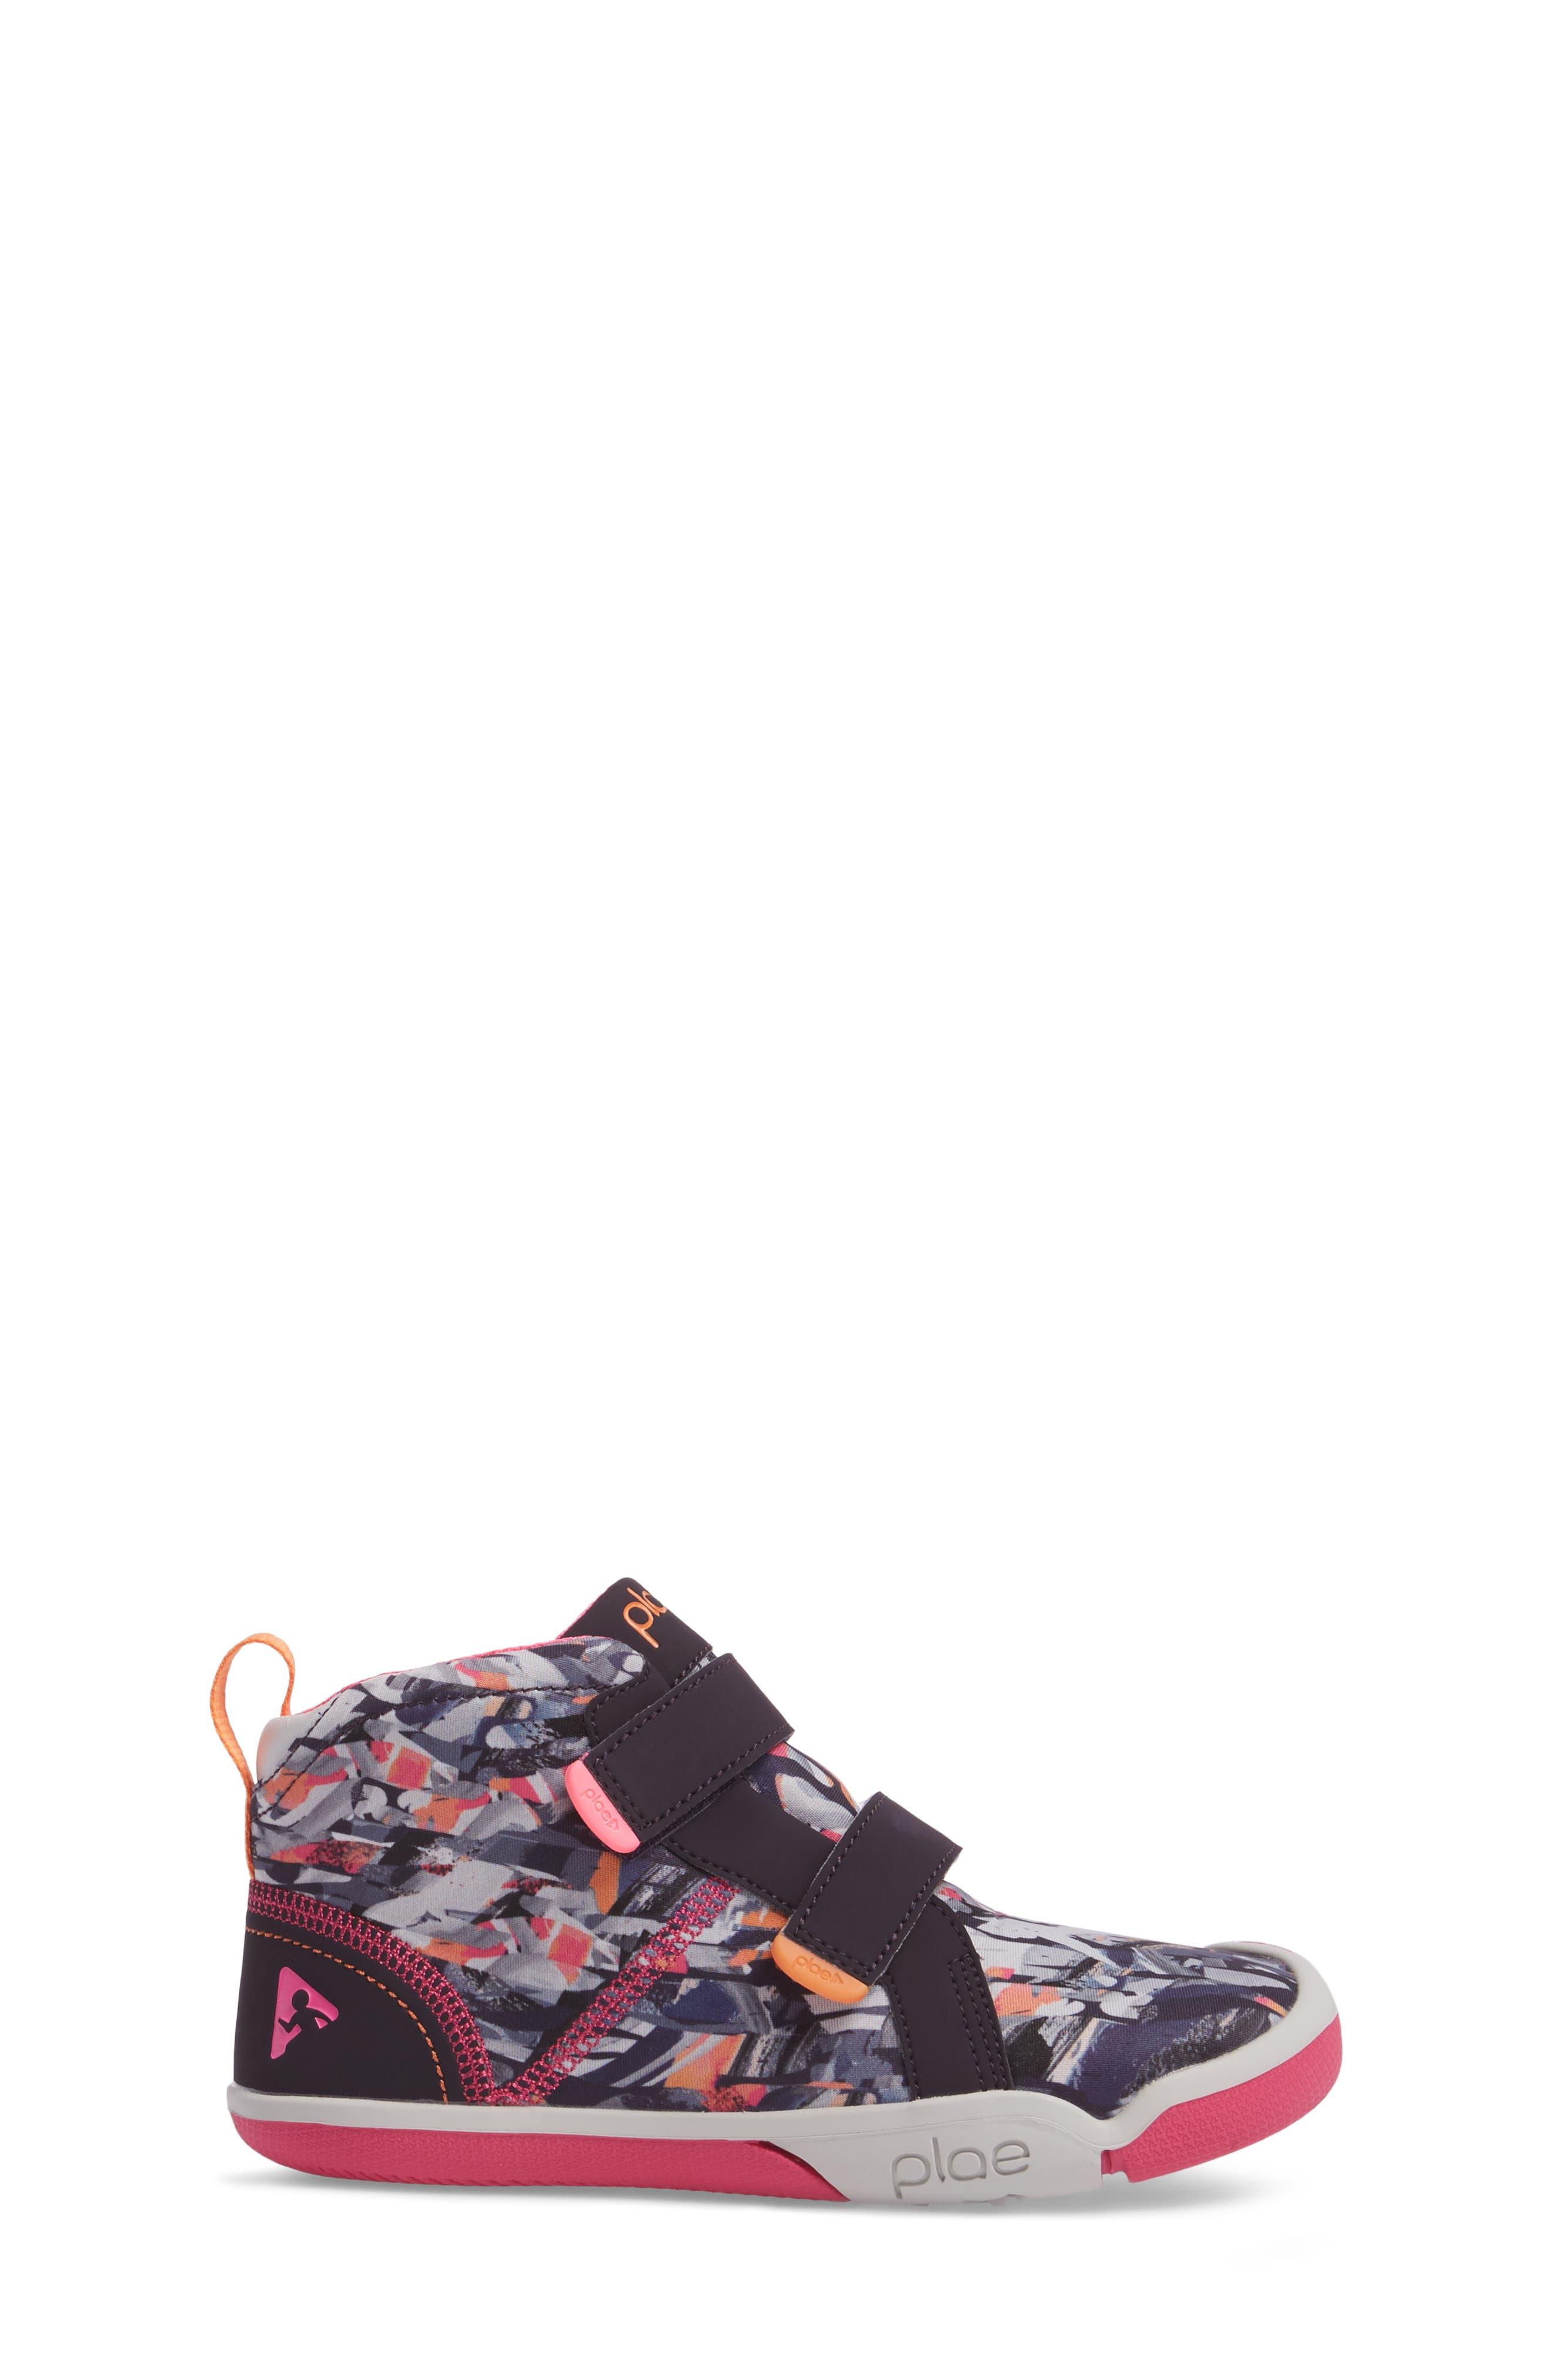 Alternate Image 3  - PLAE Max Customizable Mid Top Sneaker (Toddler & Little Kid)